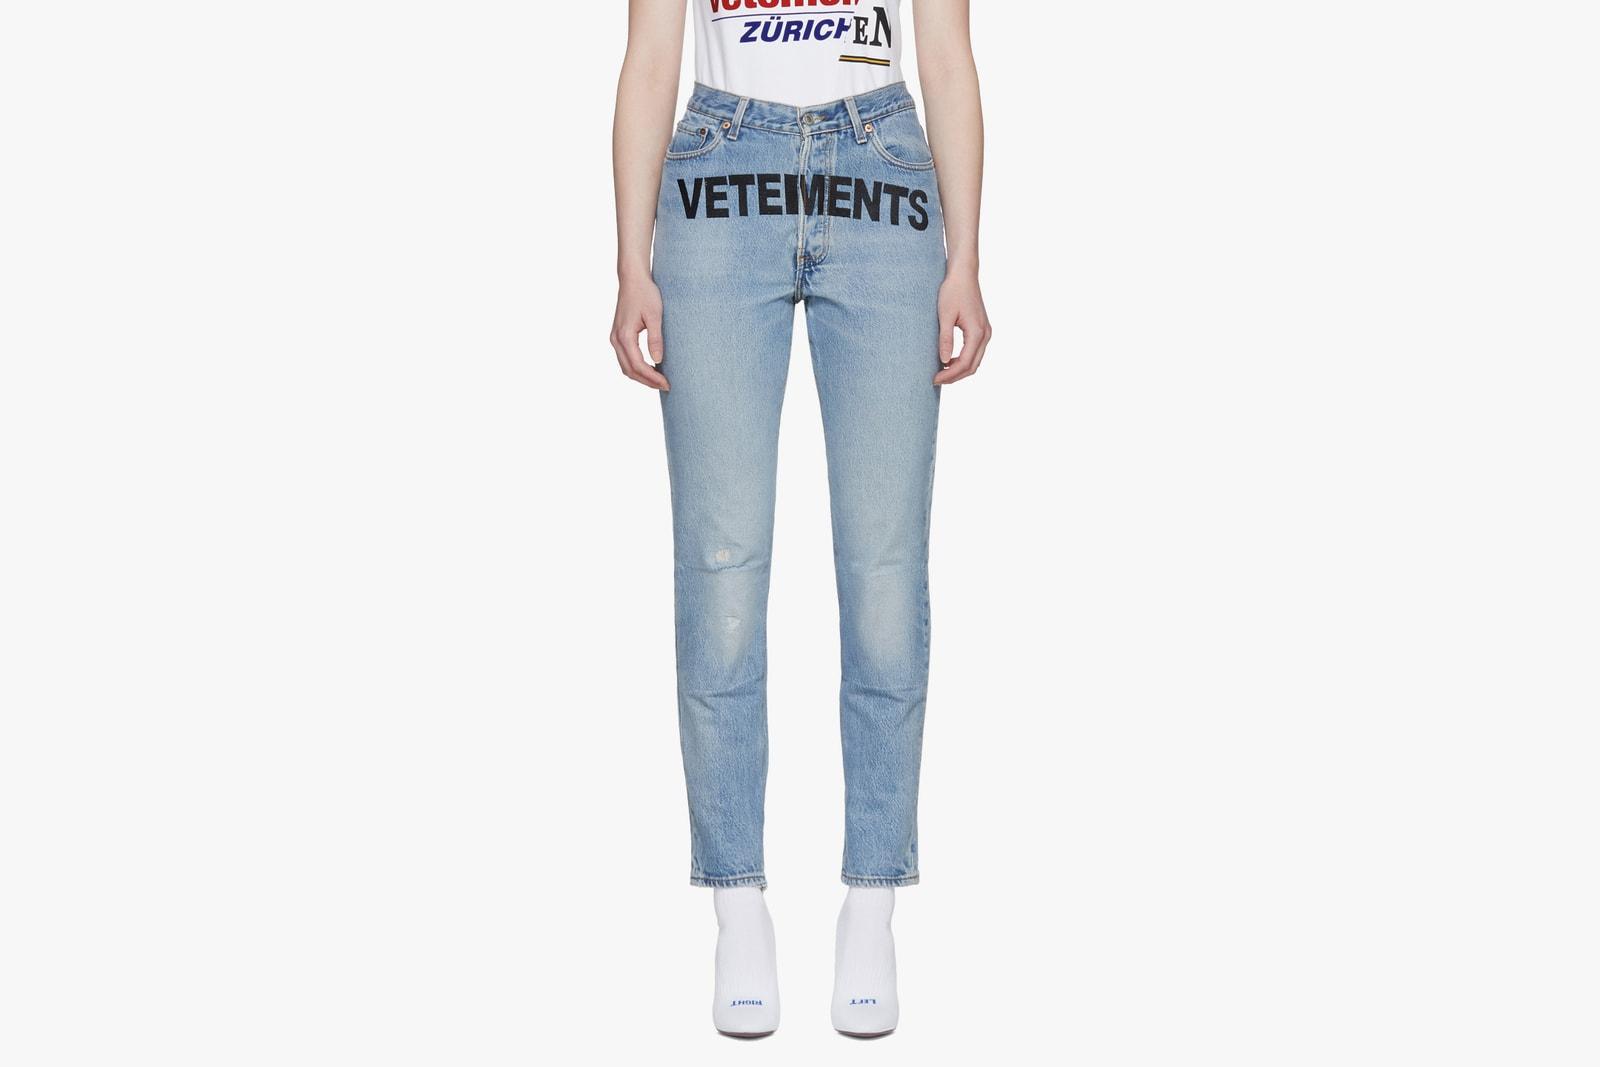 Luxury Denim from Balenciaga, Vetements Versace Helmut Lang Jeans Gosha Rubchinskiy Alexander Wang